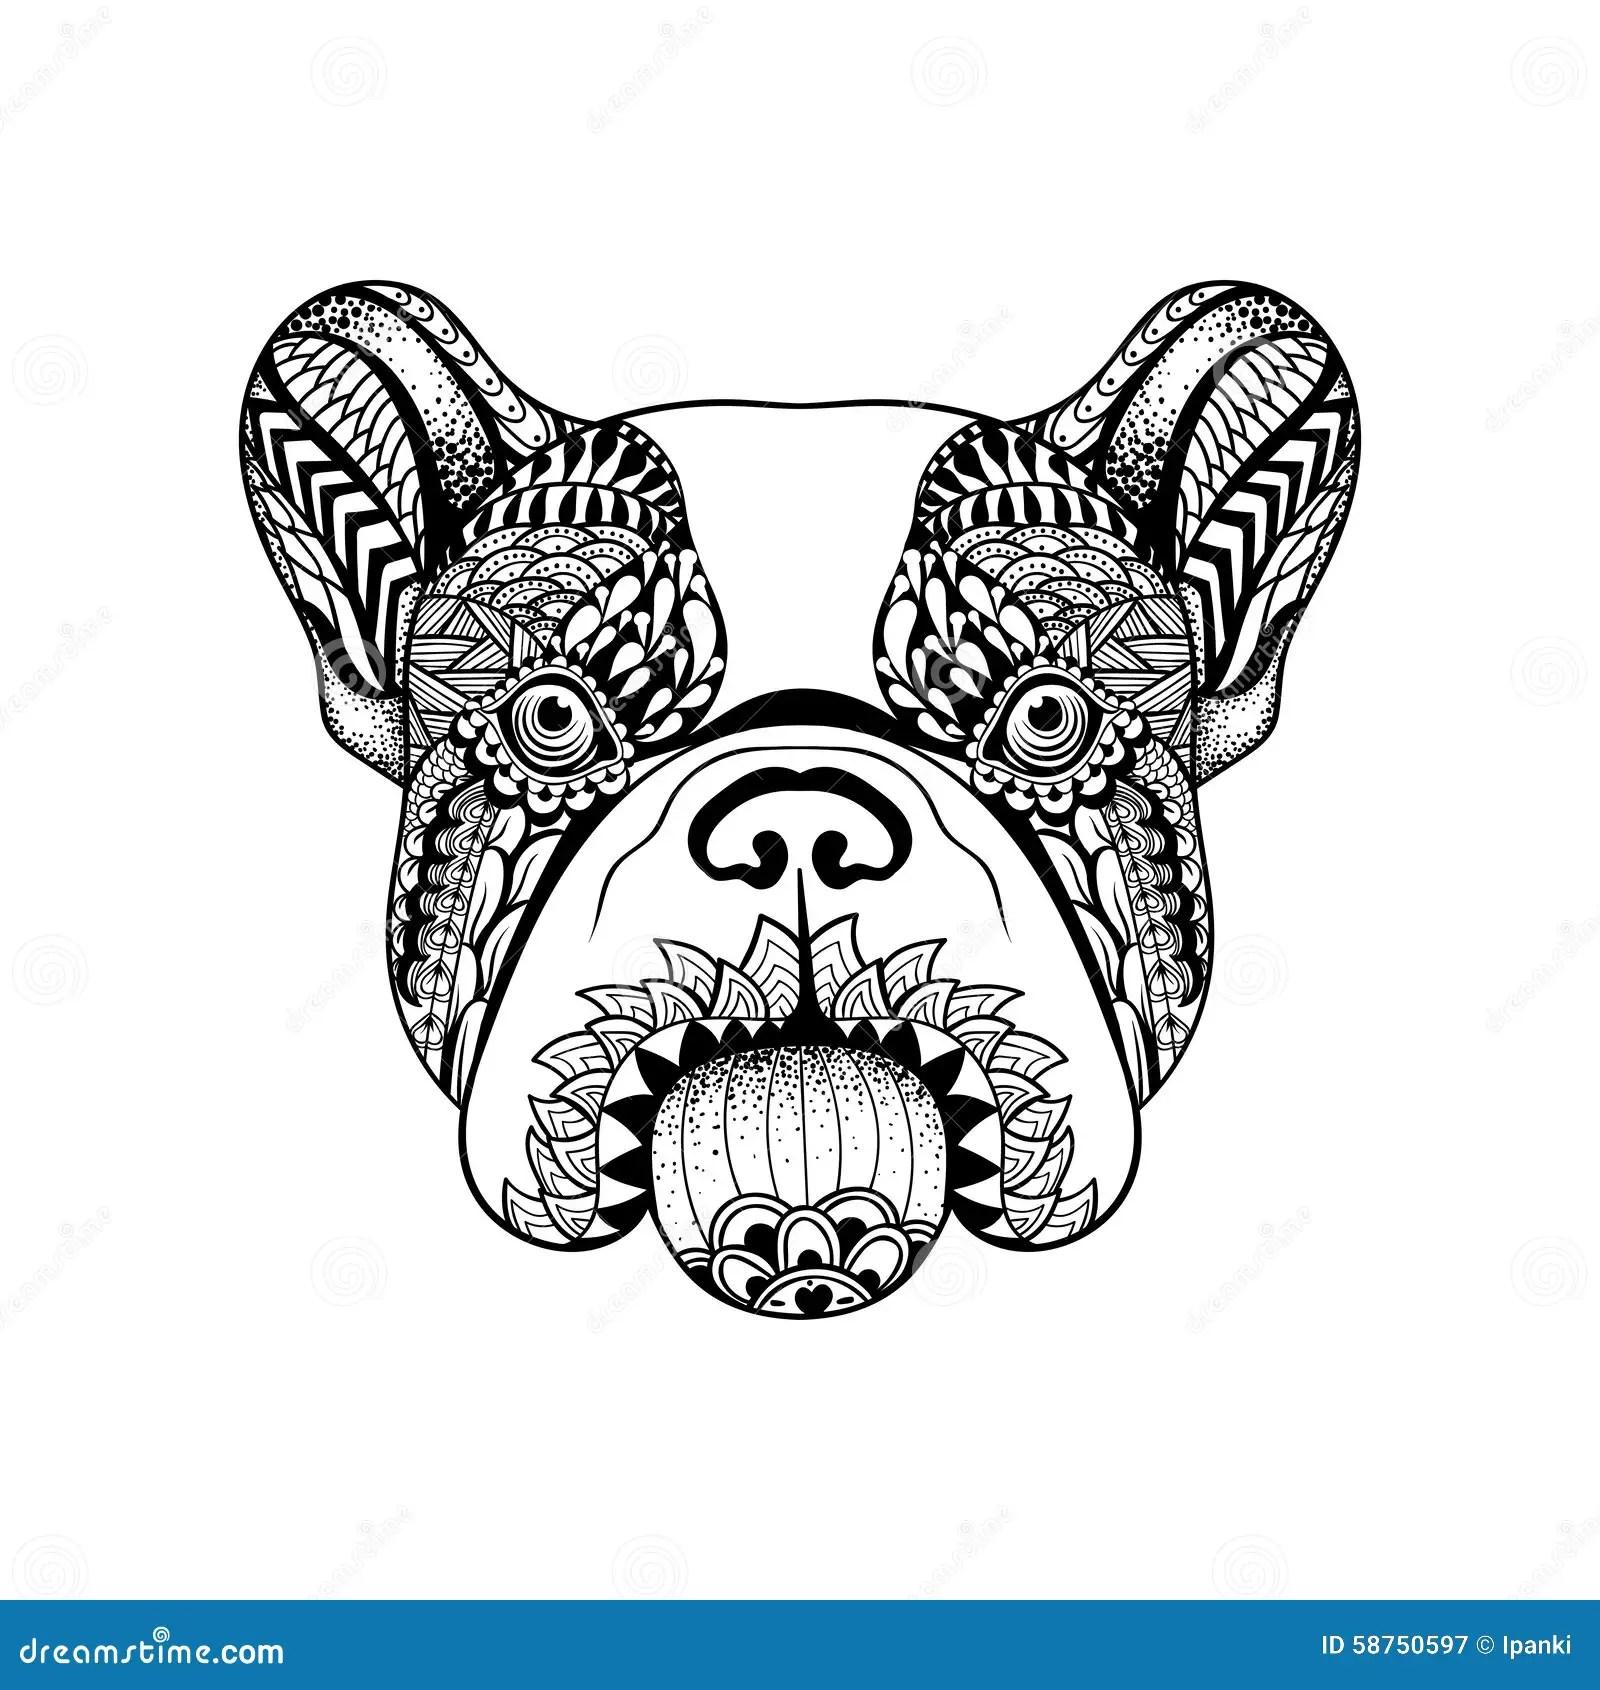 Zentangle Stylized French Bulldog Face Hand Drawn Dog